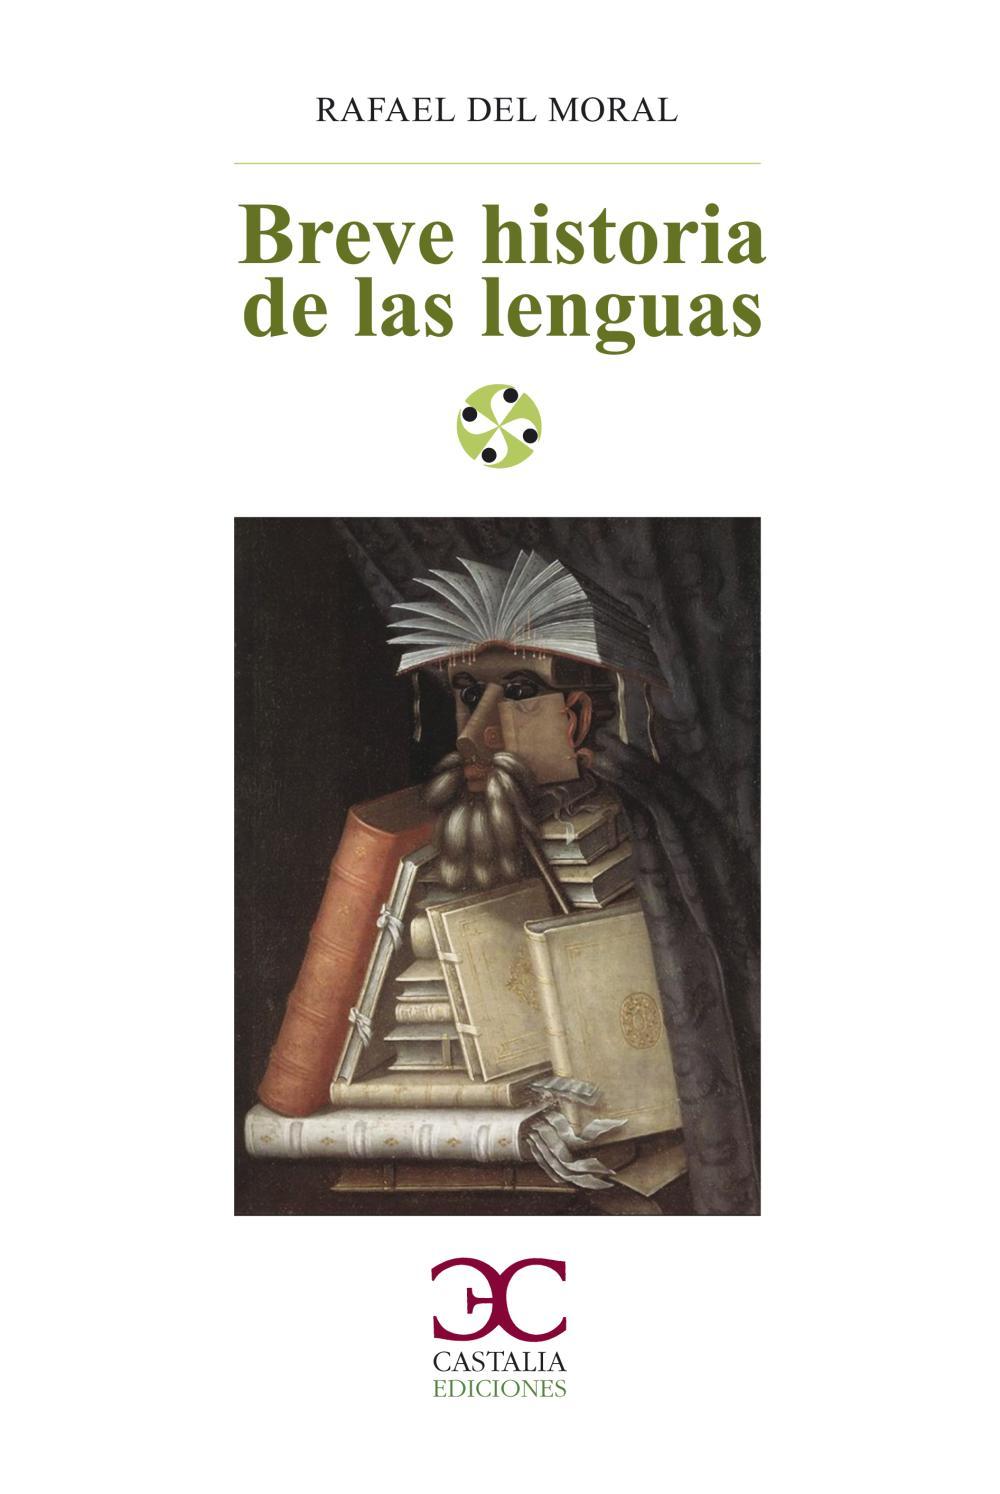 Breve historia de las lenguas